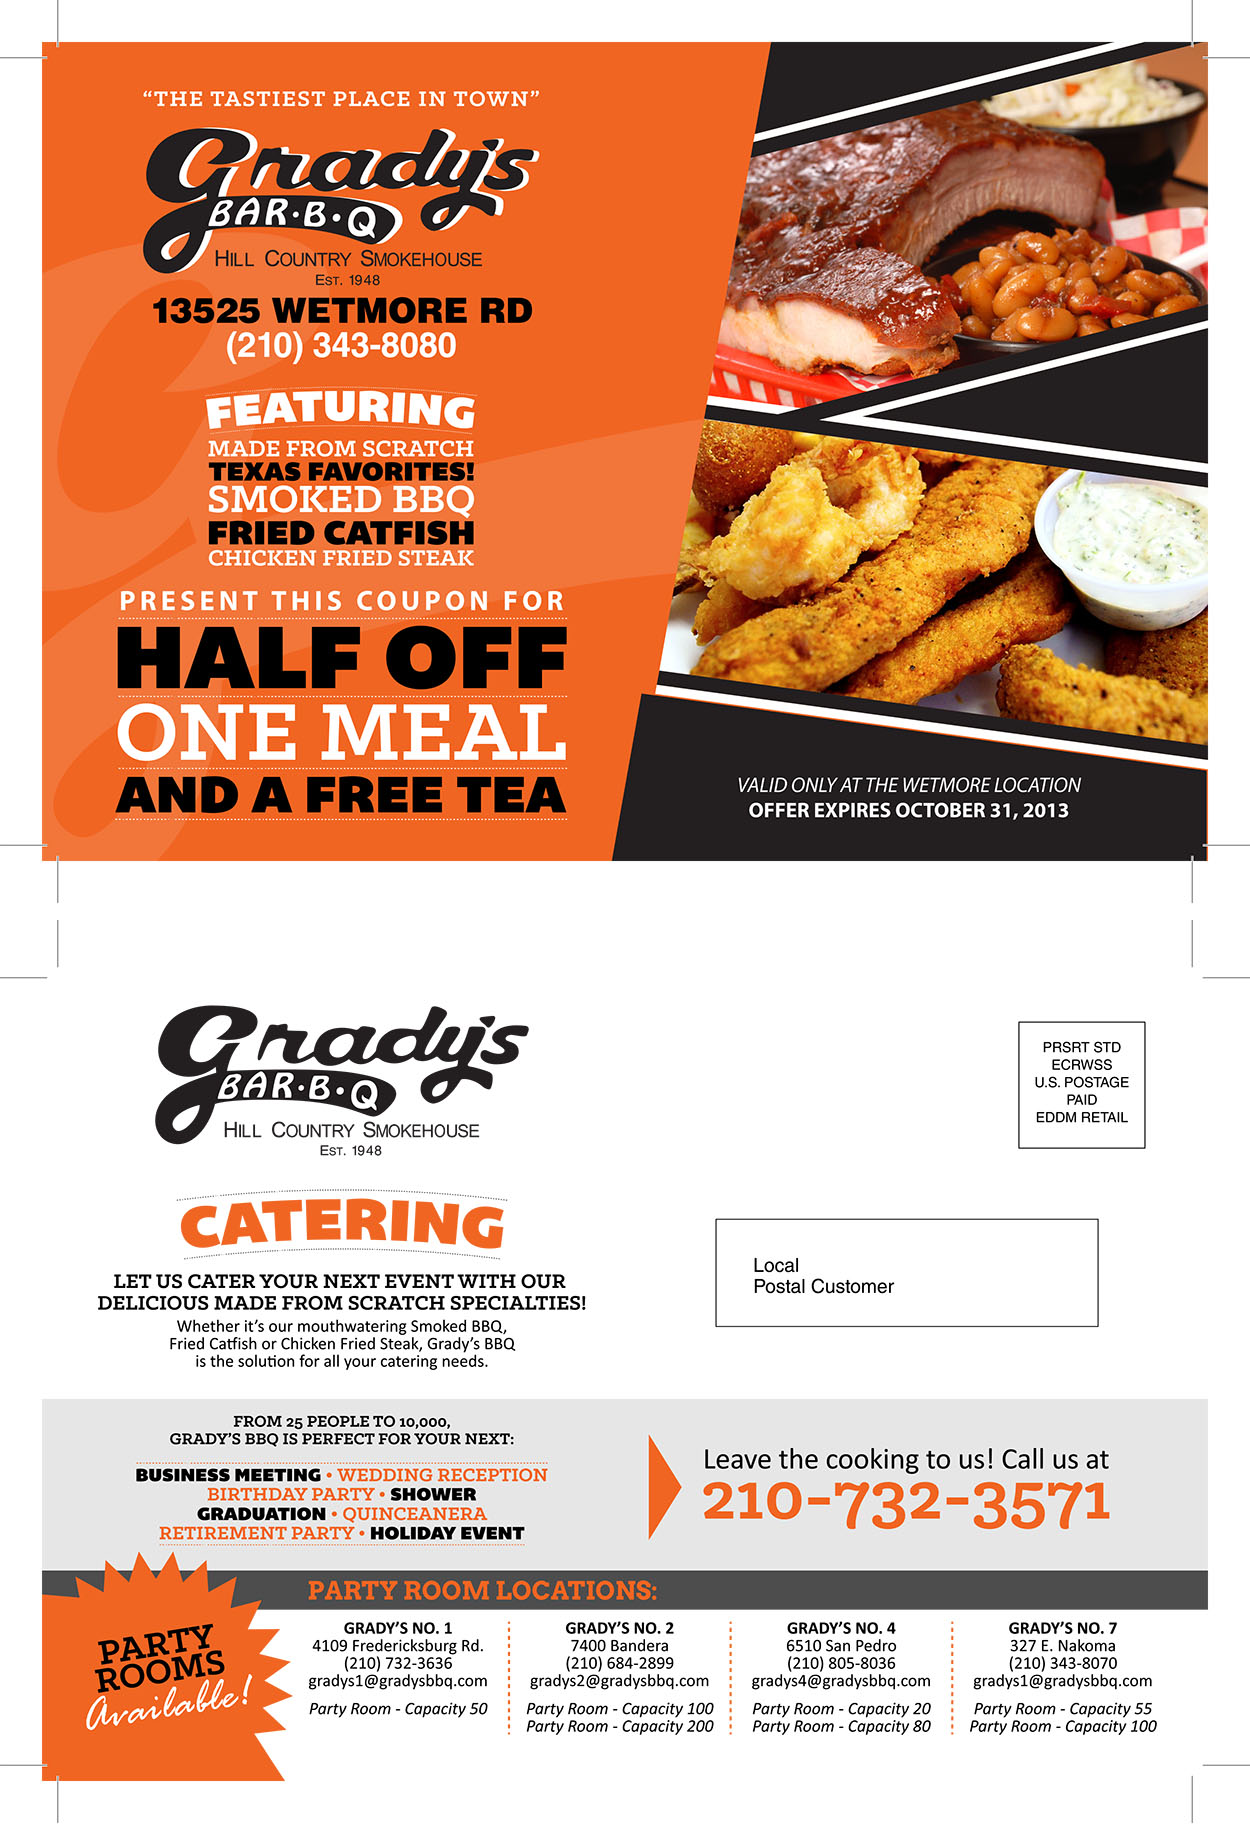 EDDM Mailer – Grady's BBQ